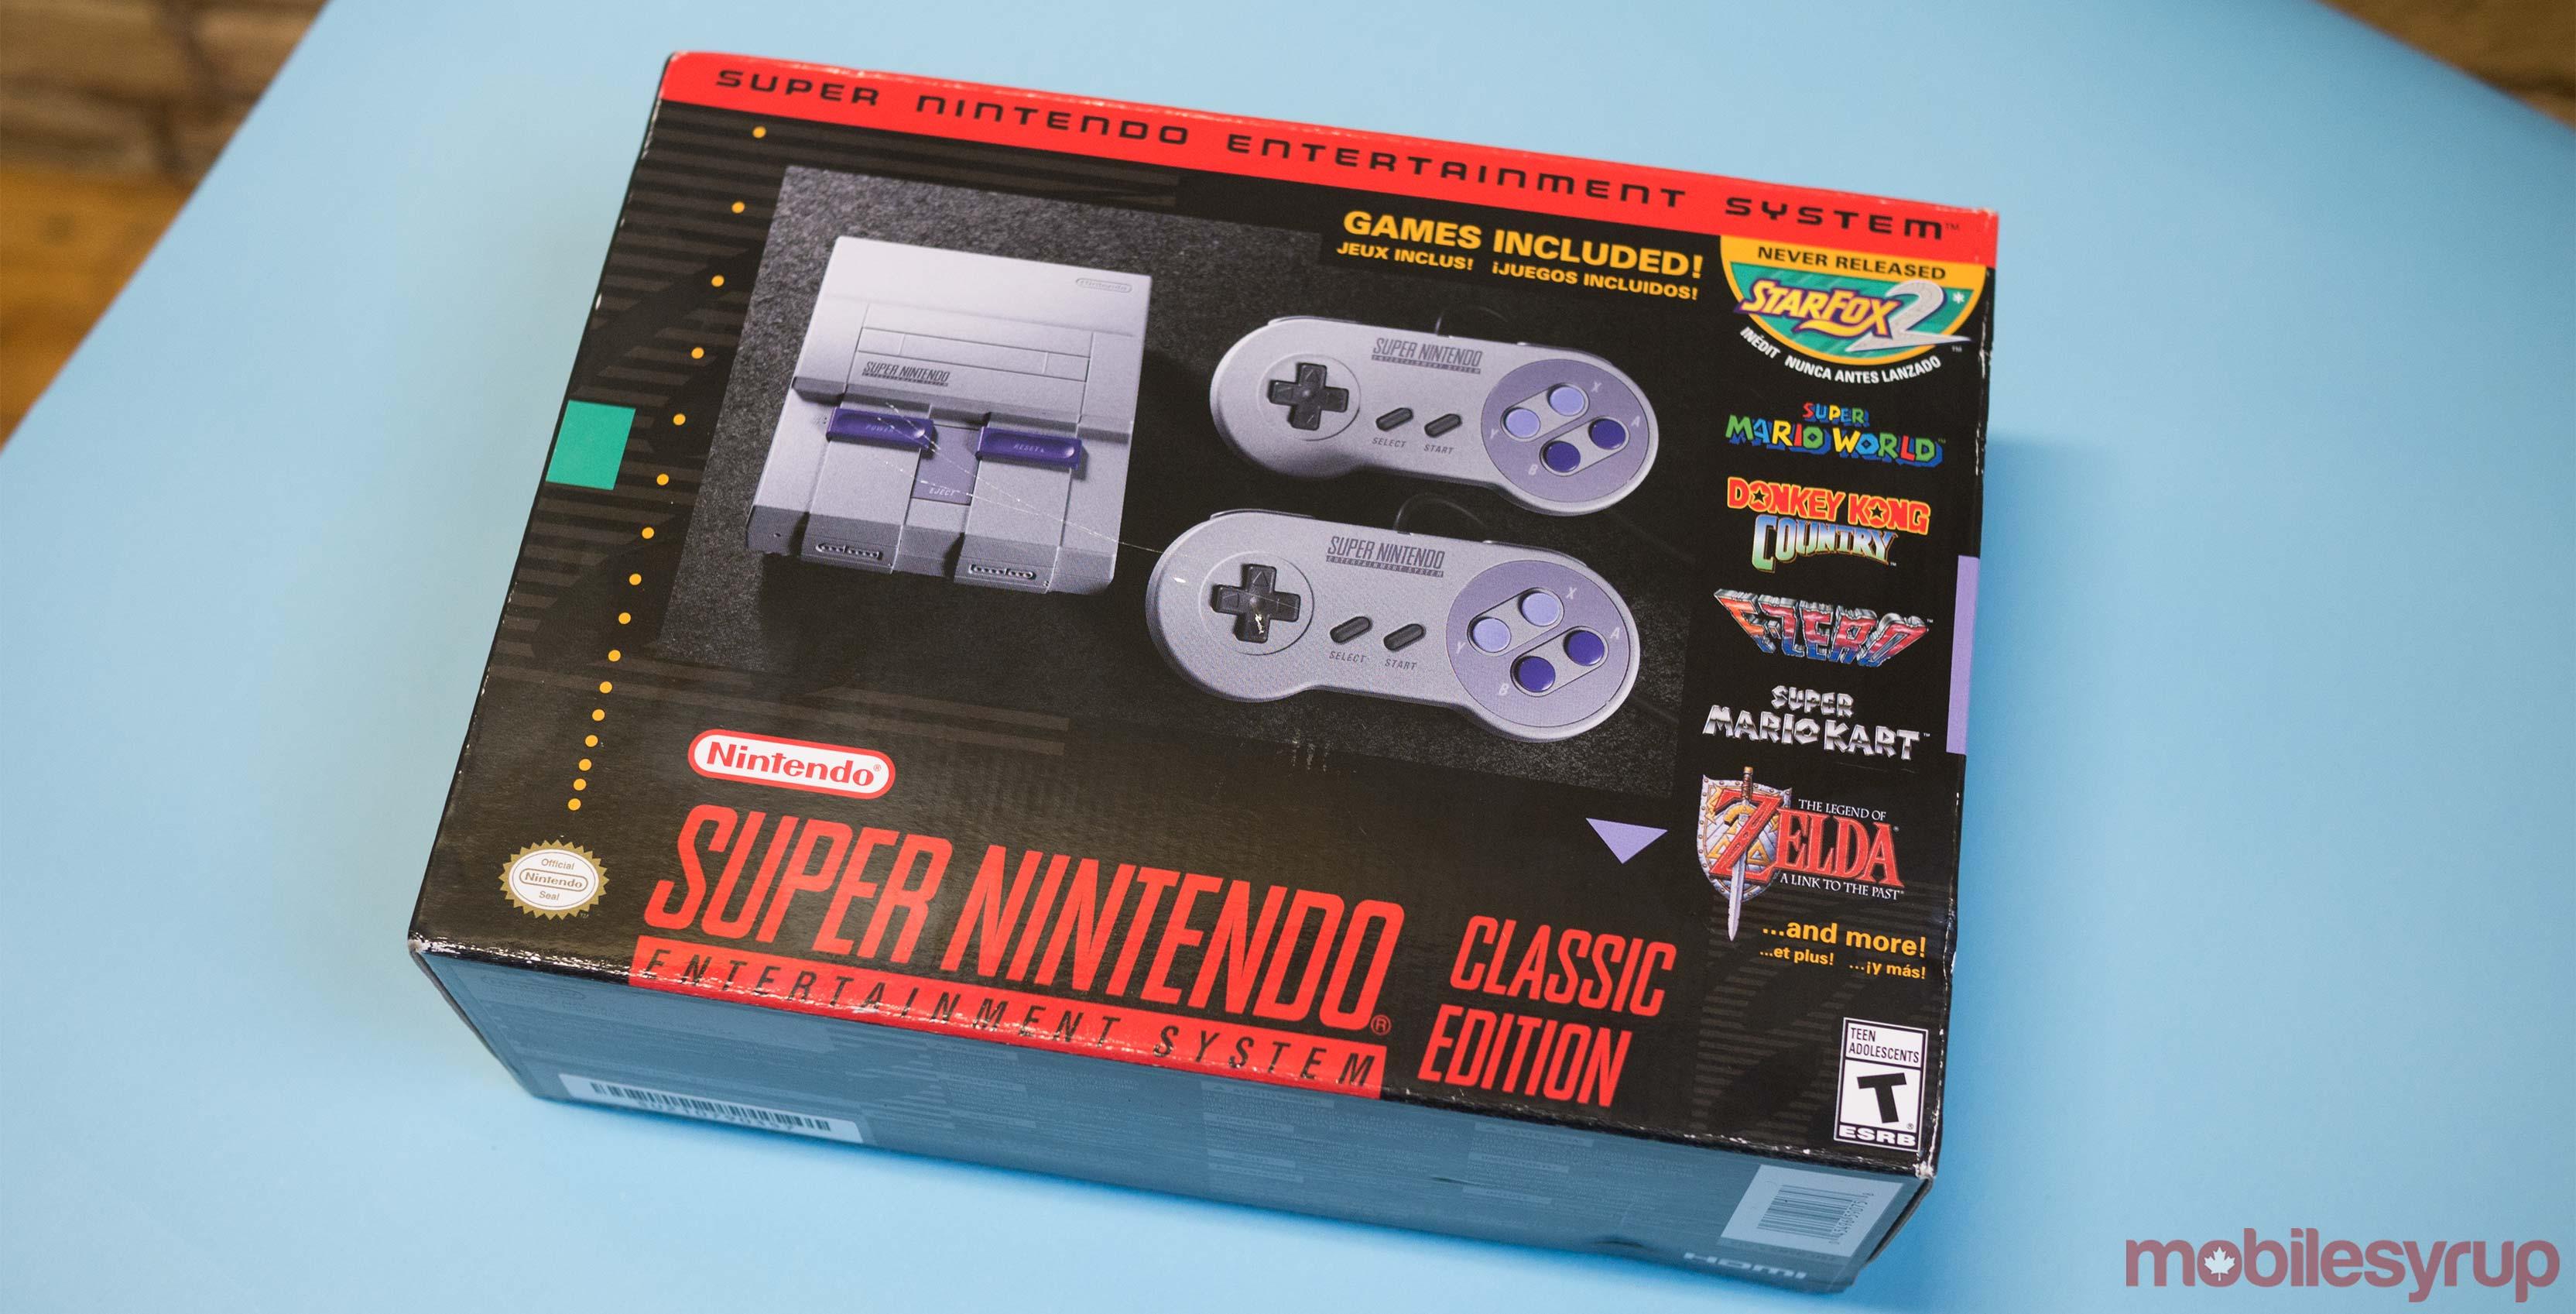 SNES Classic in box